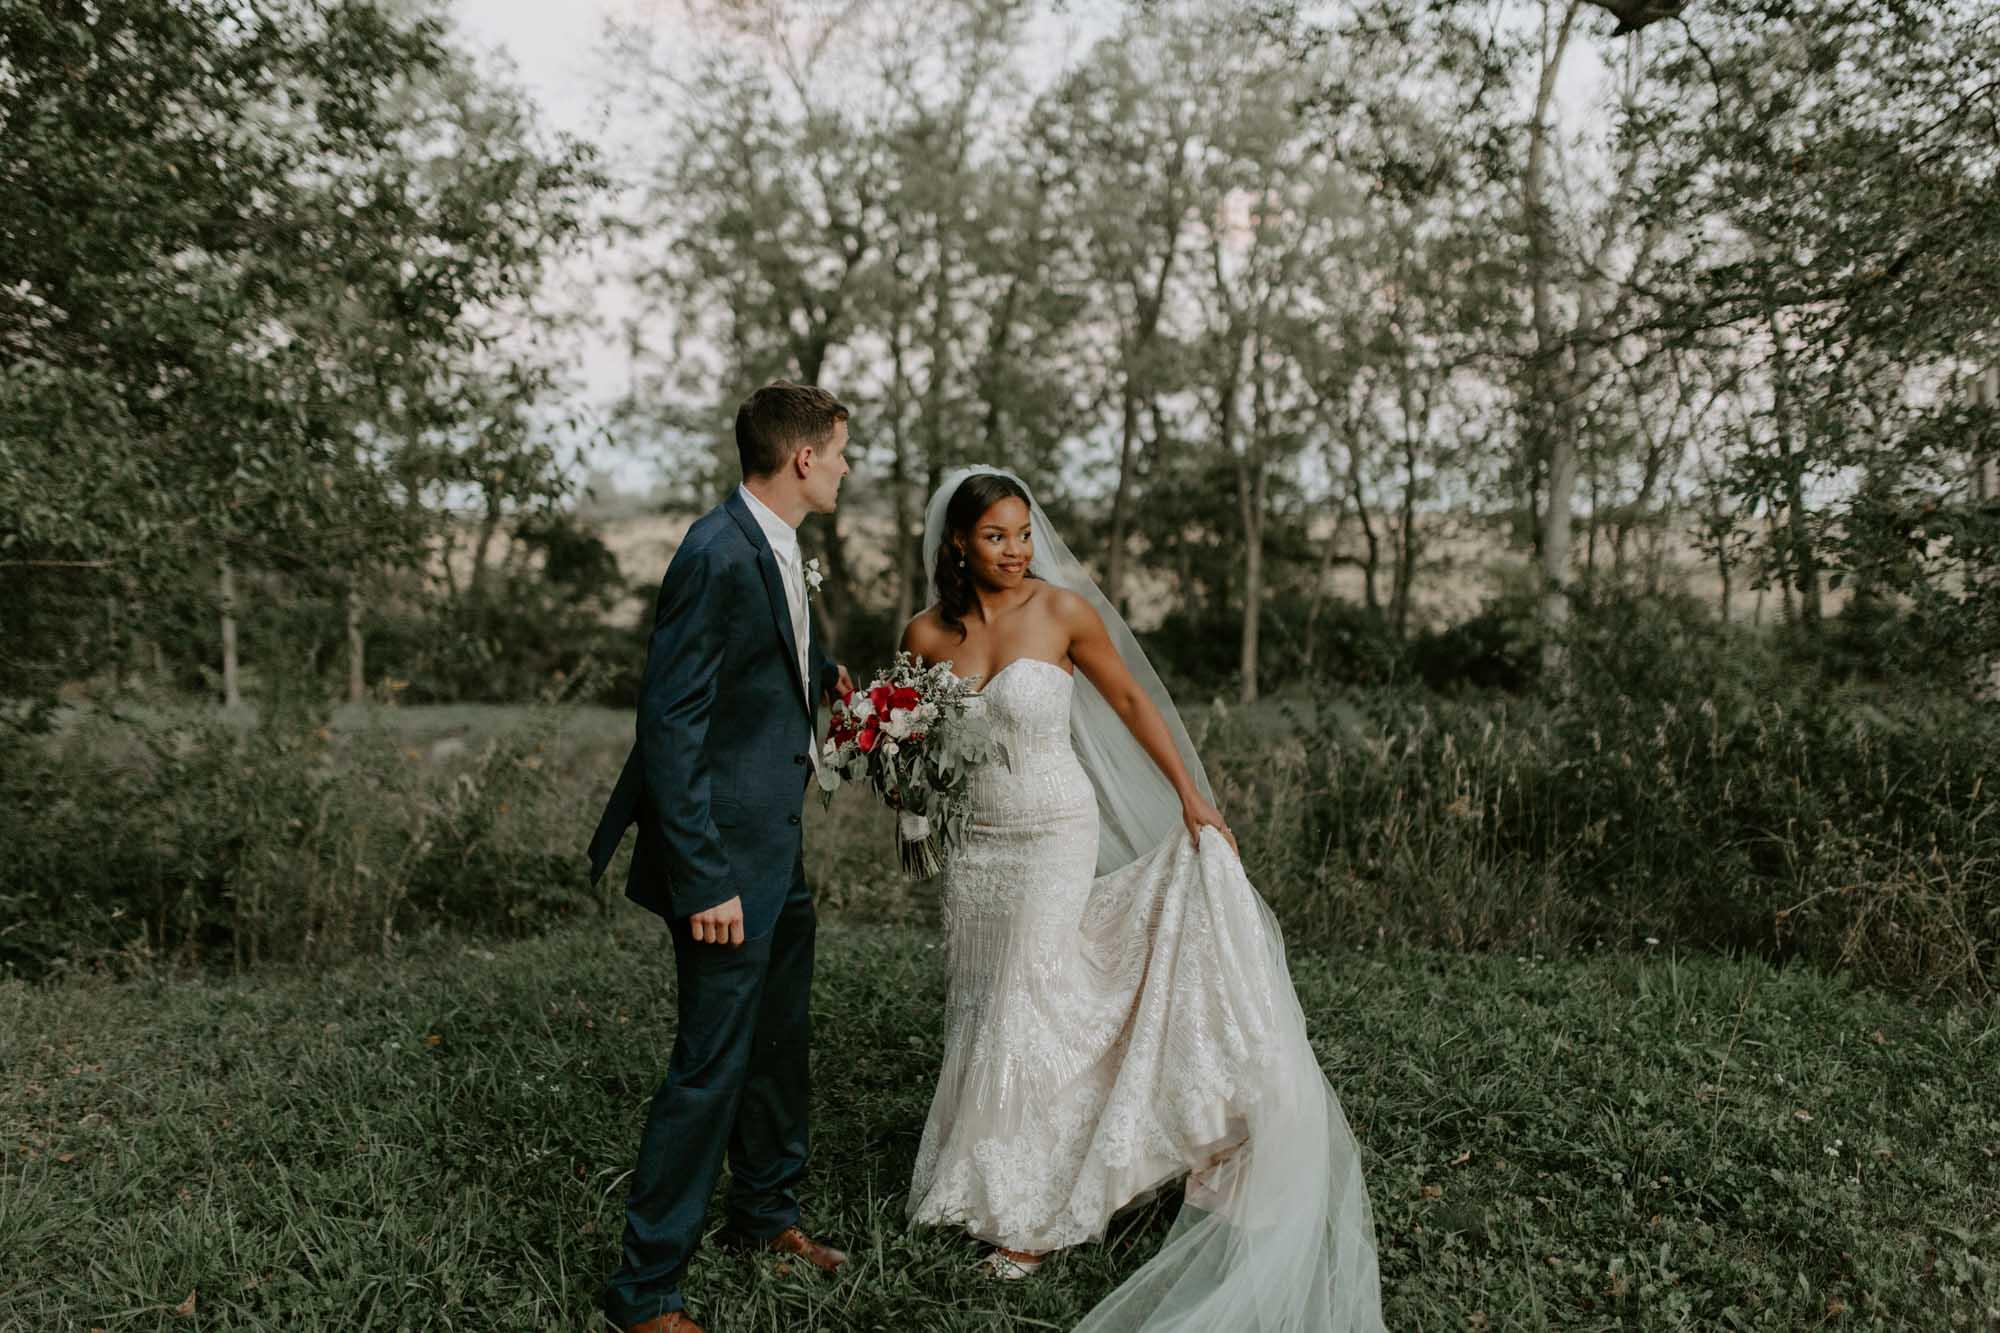 prairie_glass_house_wedding_champaign_wright_photographs_simon_0088.jpg